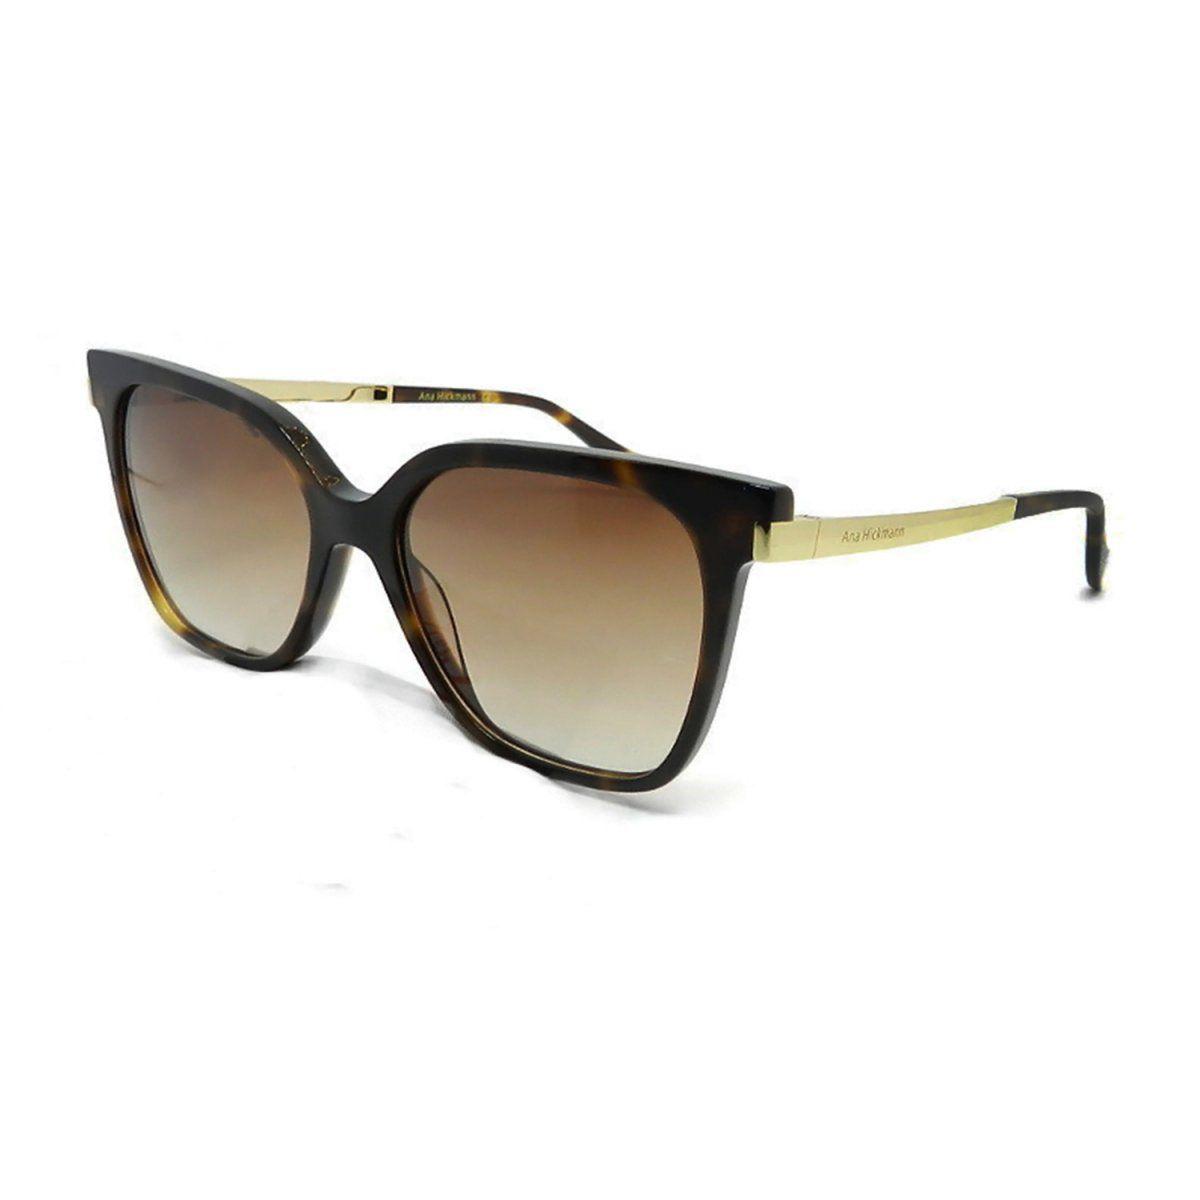 Óculos de Sol Ana Hickmann AH9277  G21 54 - 17 145 2N